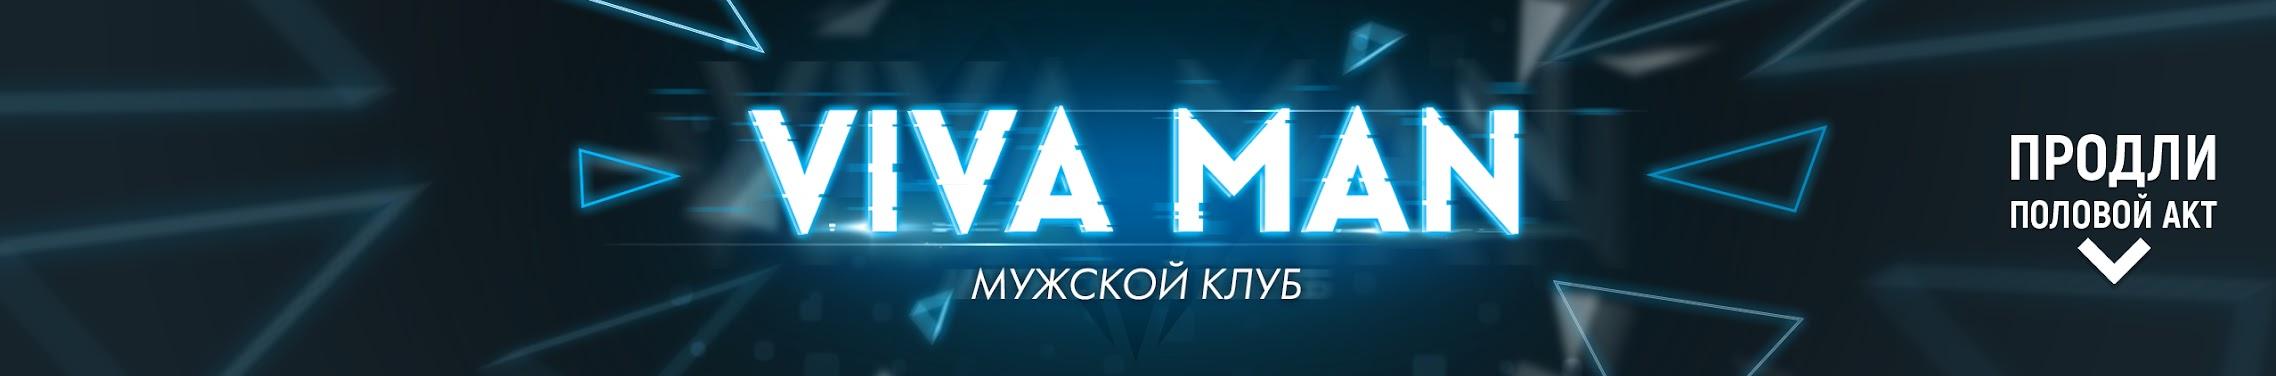 Мужской клуб no 1 харизма караоке клуб москва